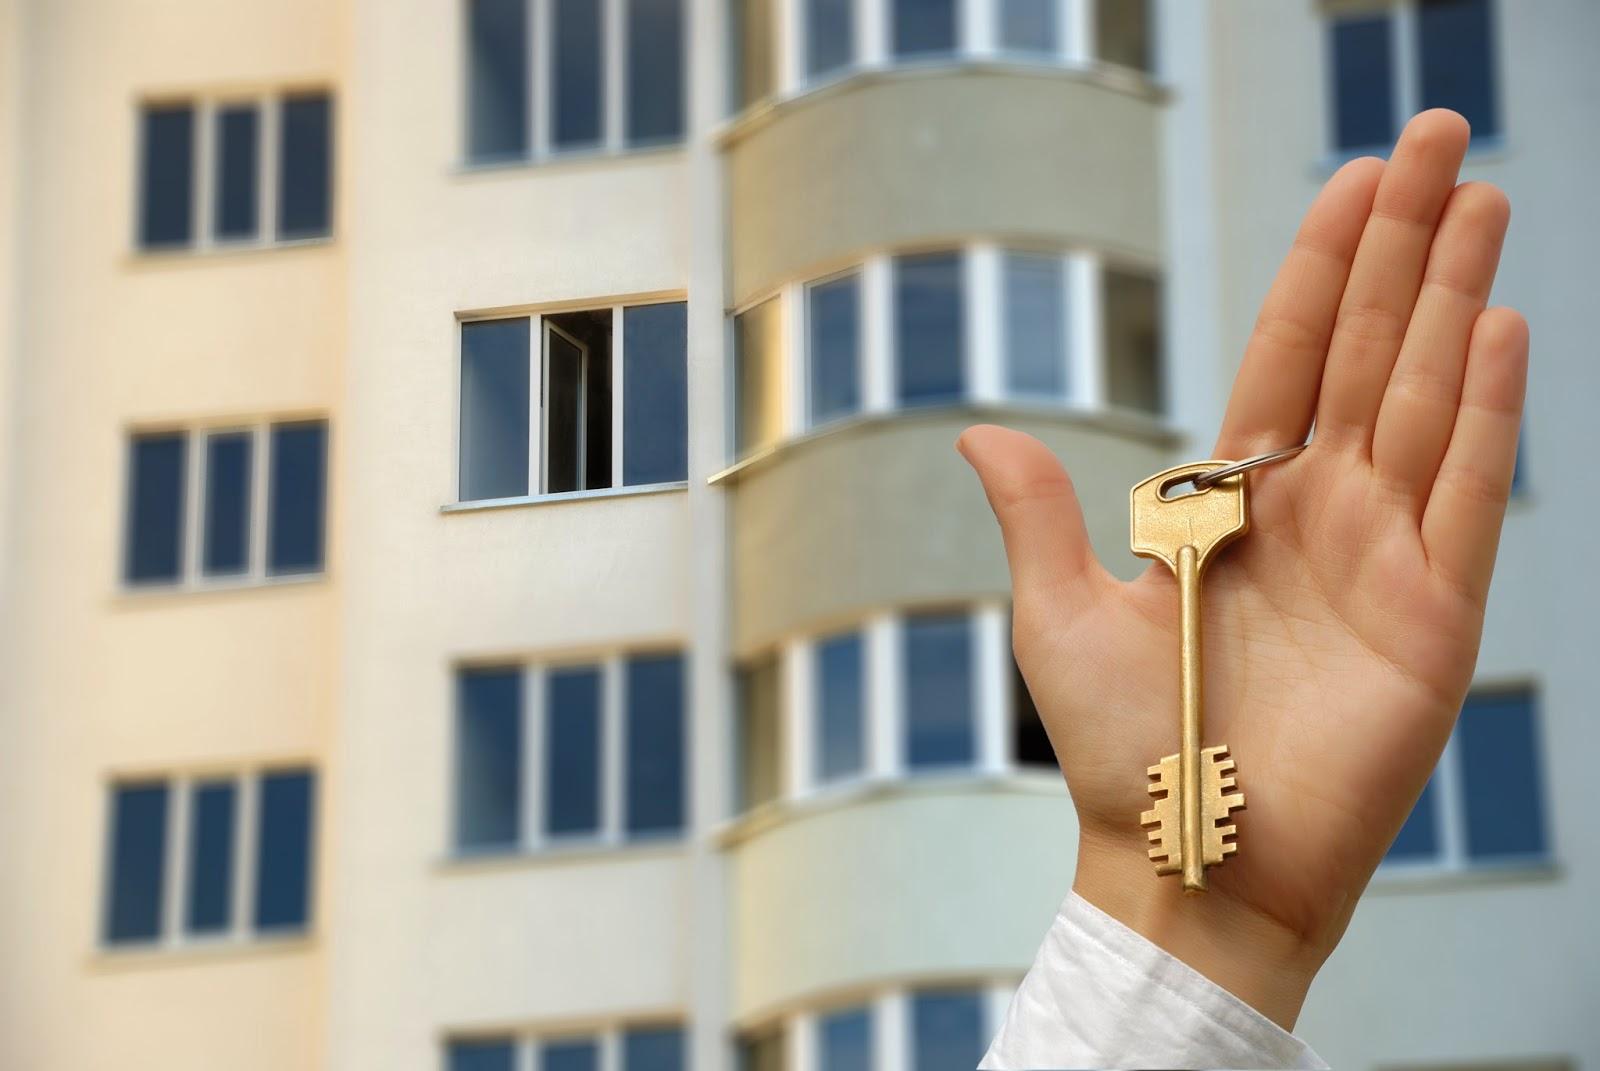 Man holding apartment master key